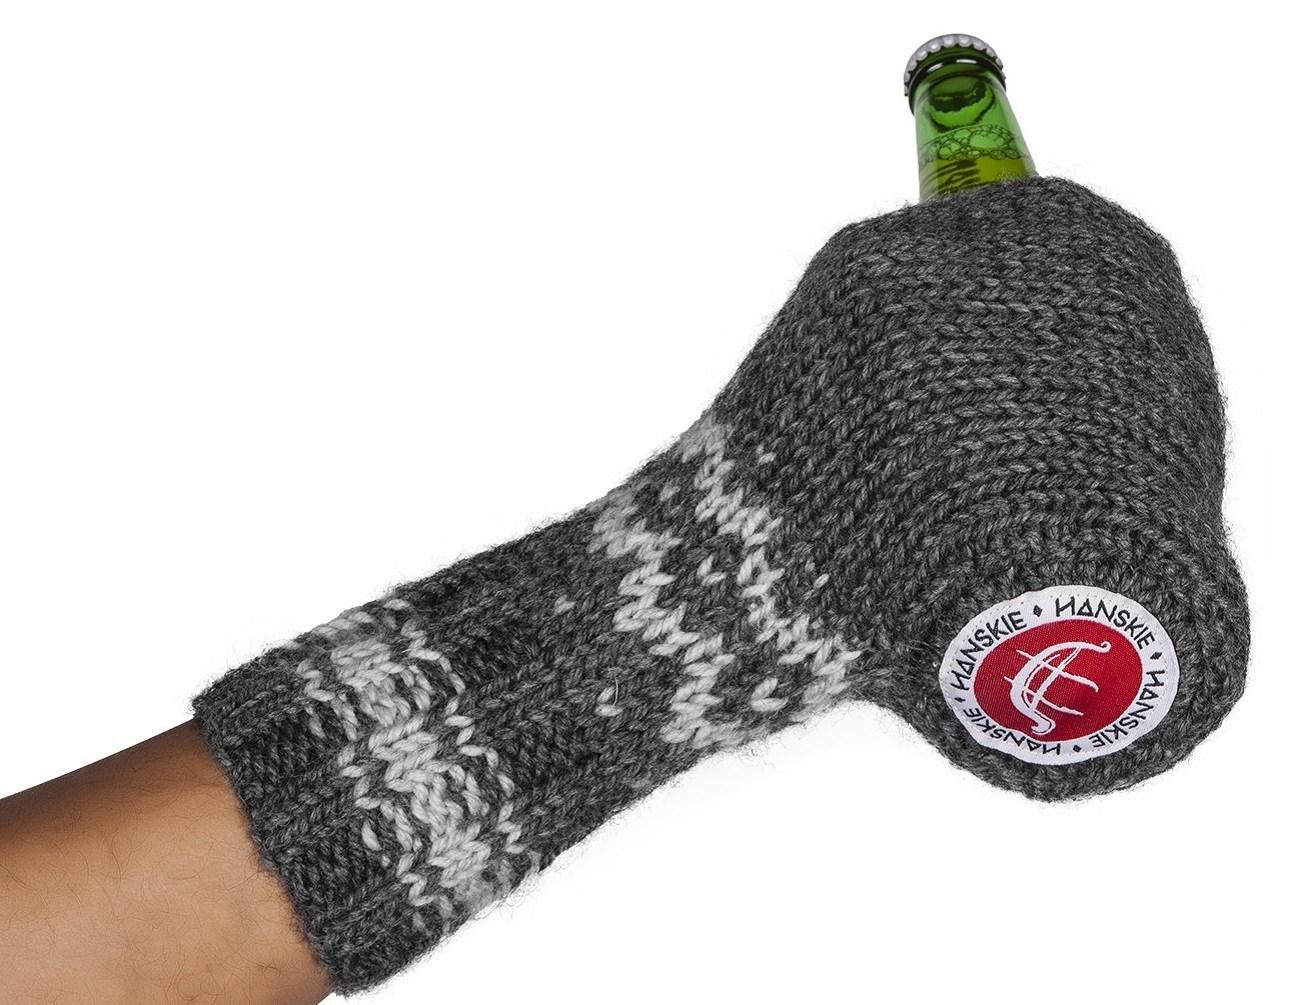 Skuuzi+Glove